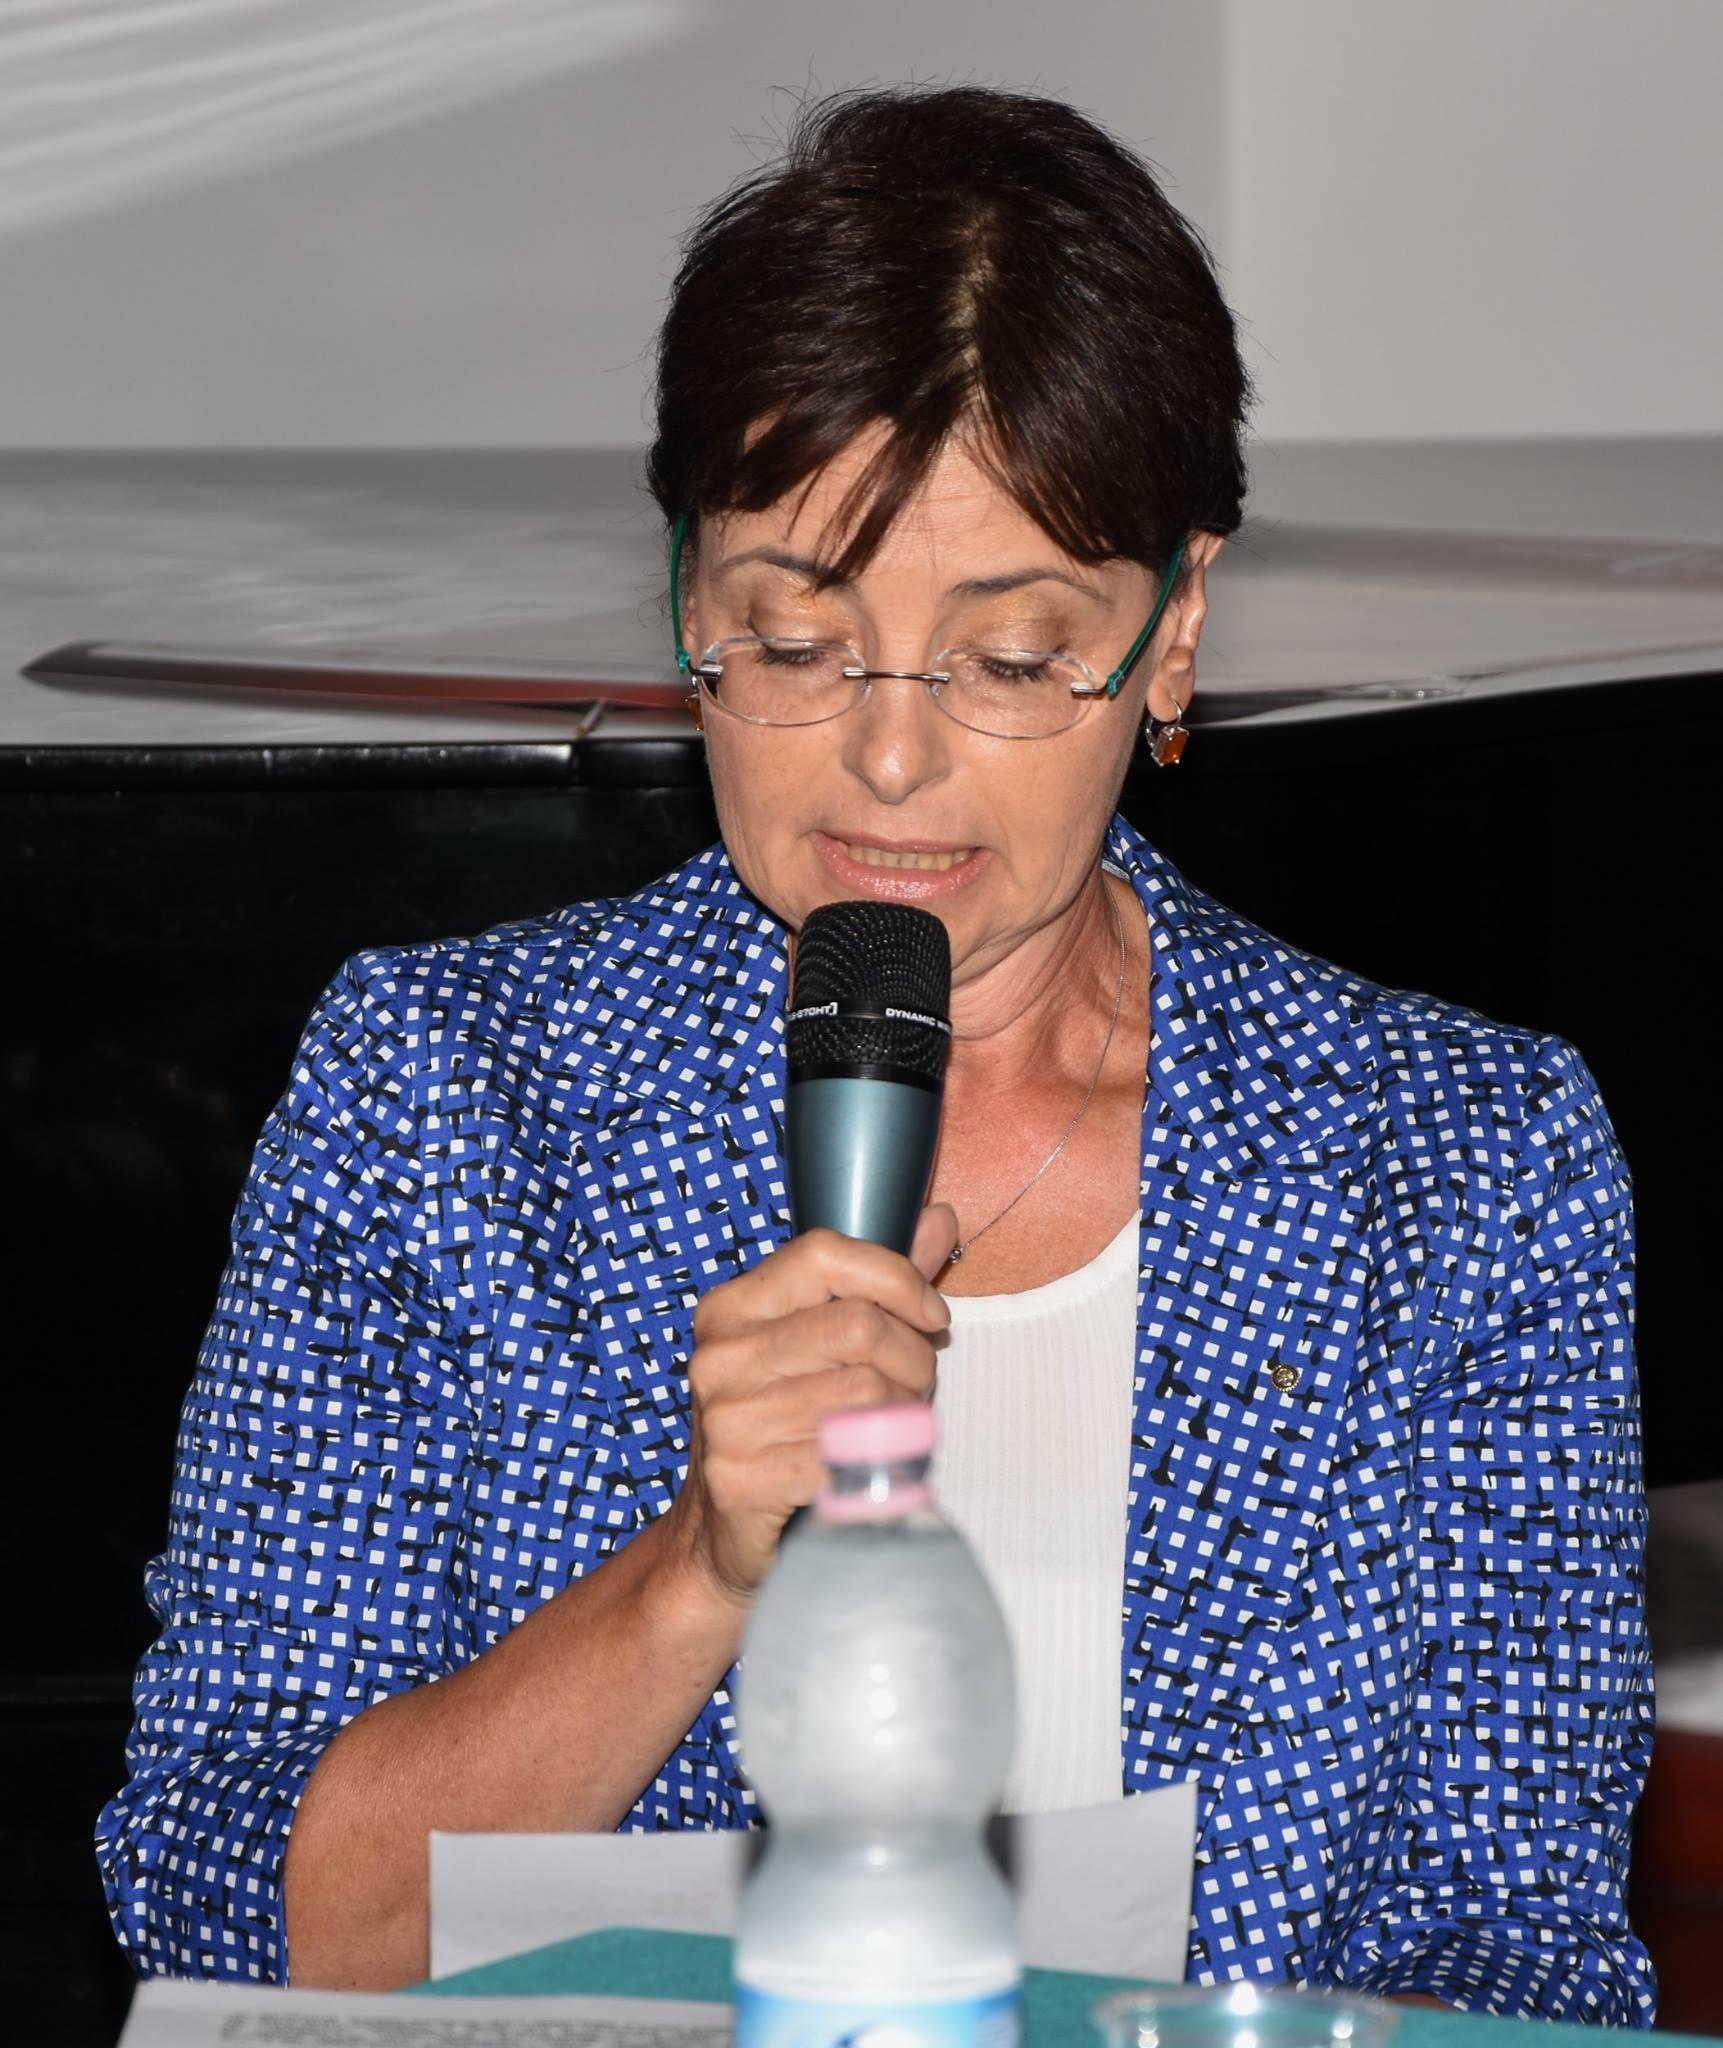 Paola Pavesi